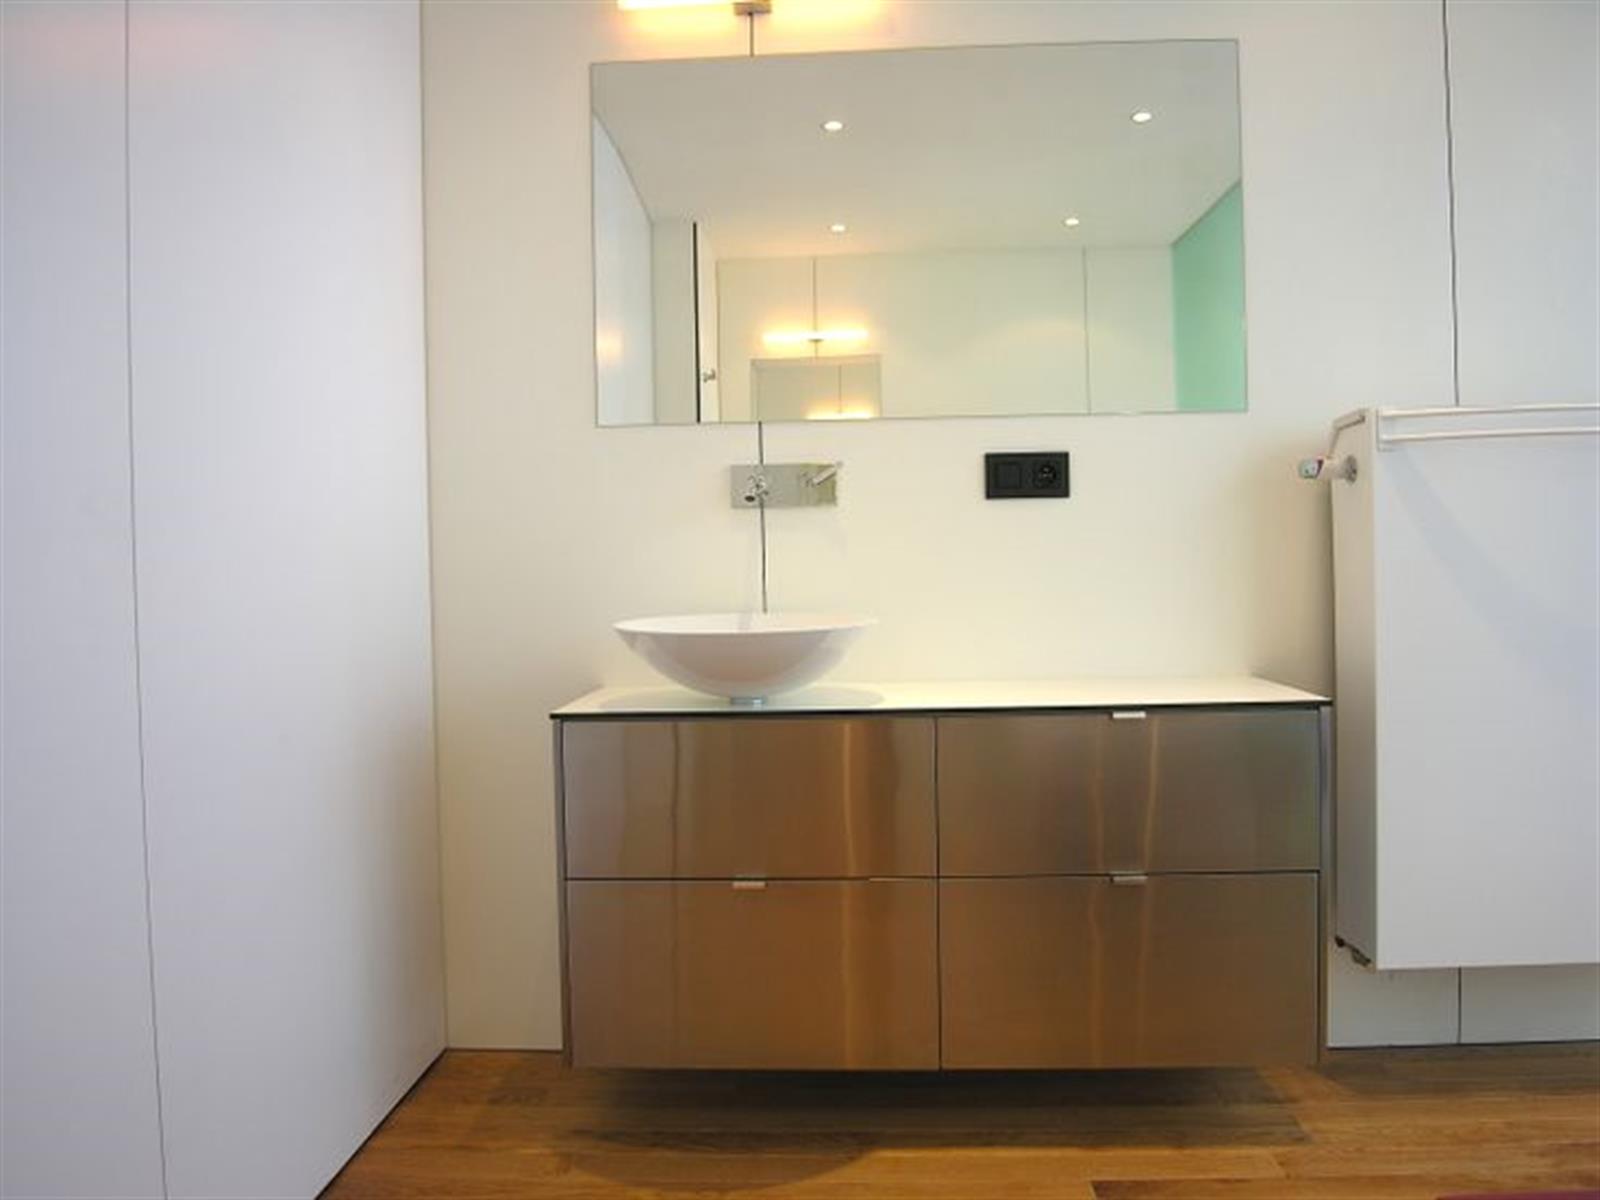 House - Etterbeek - #4448725-16